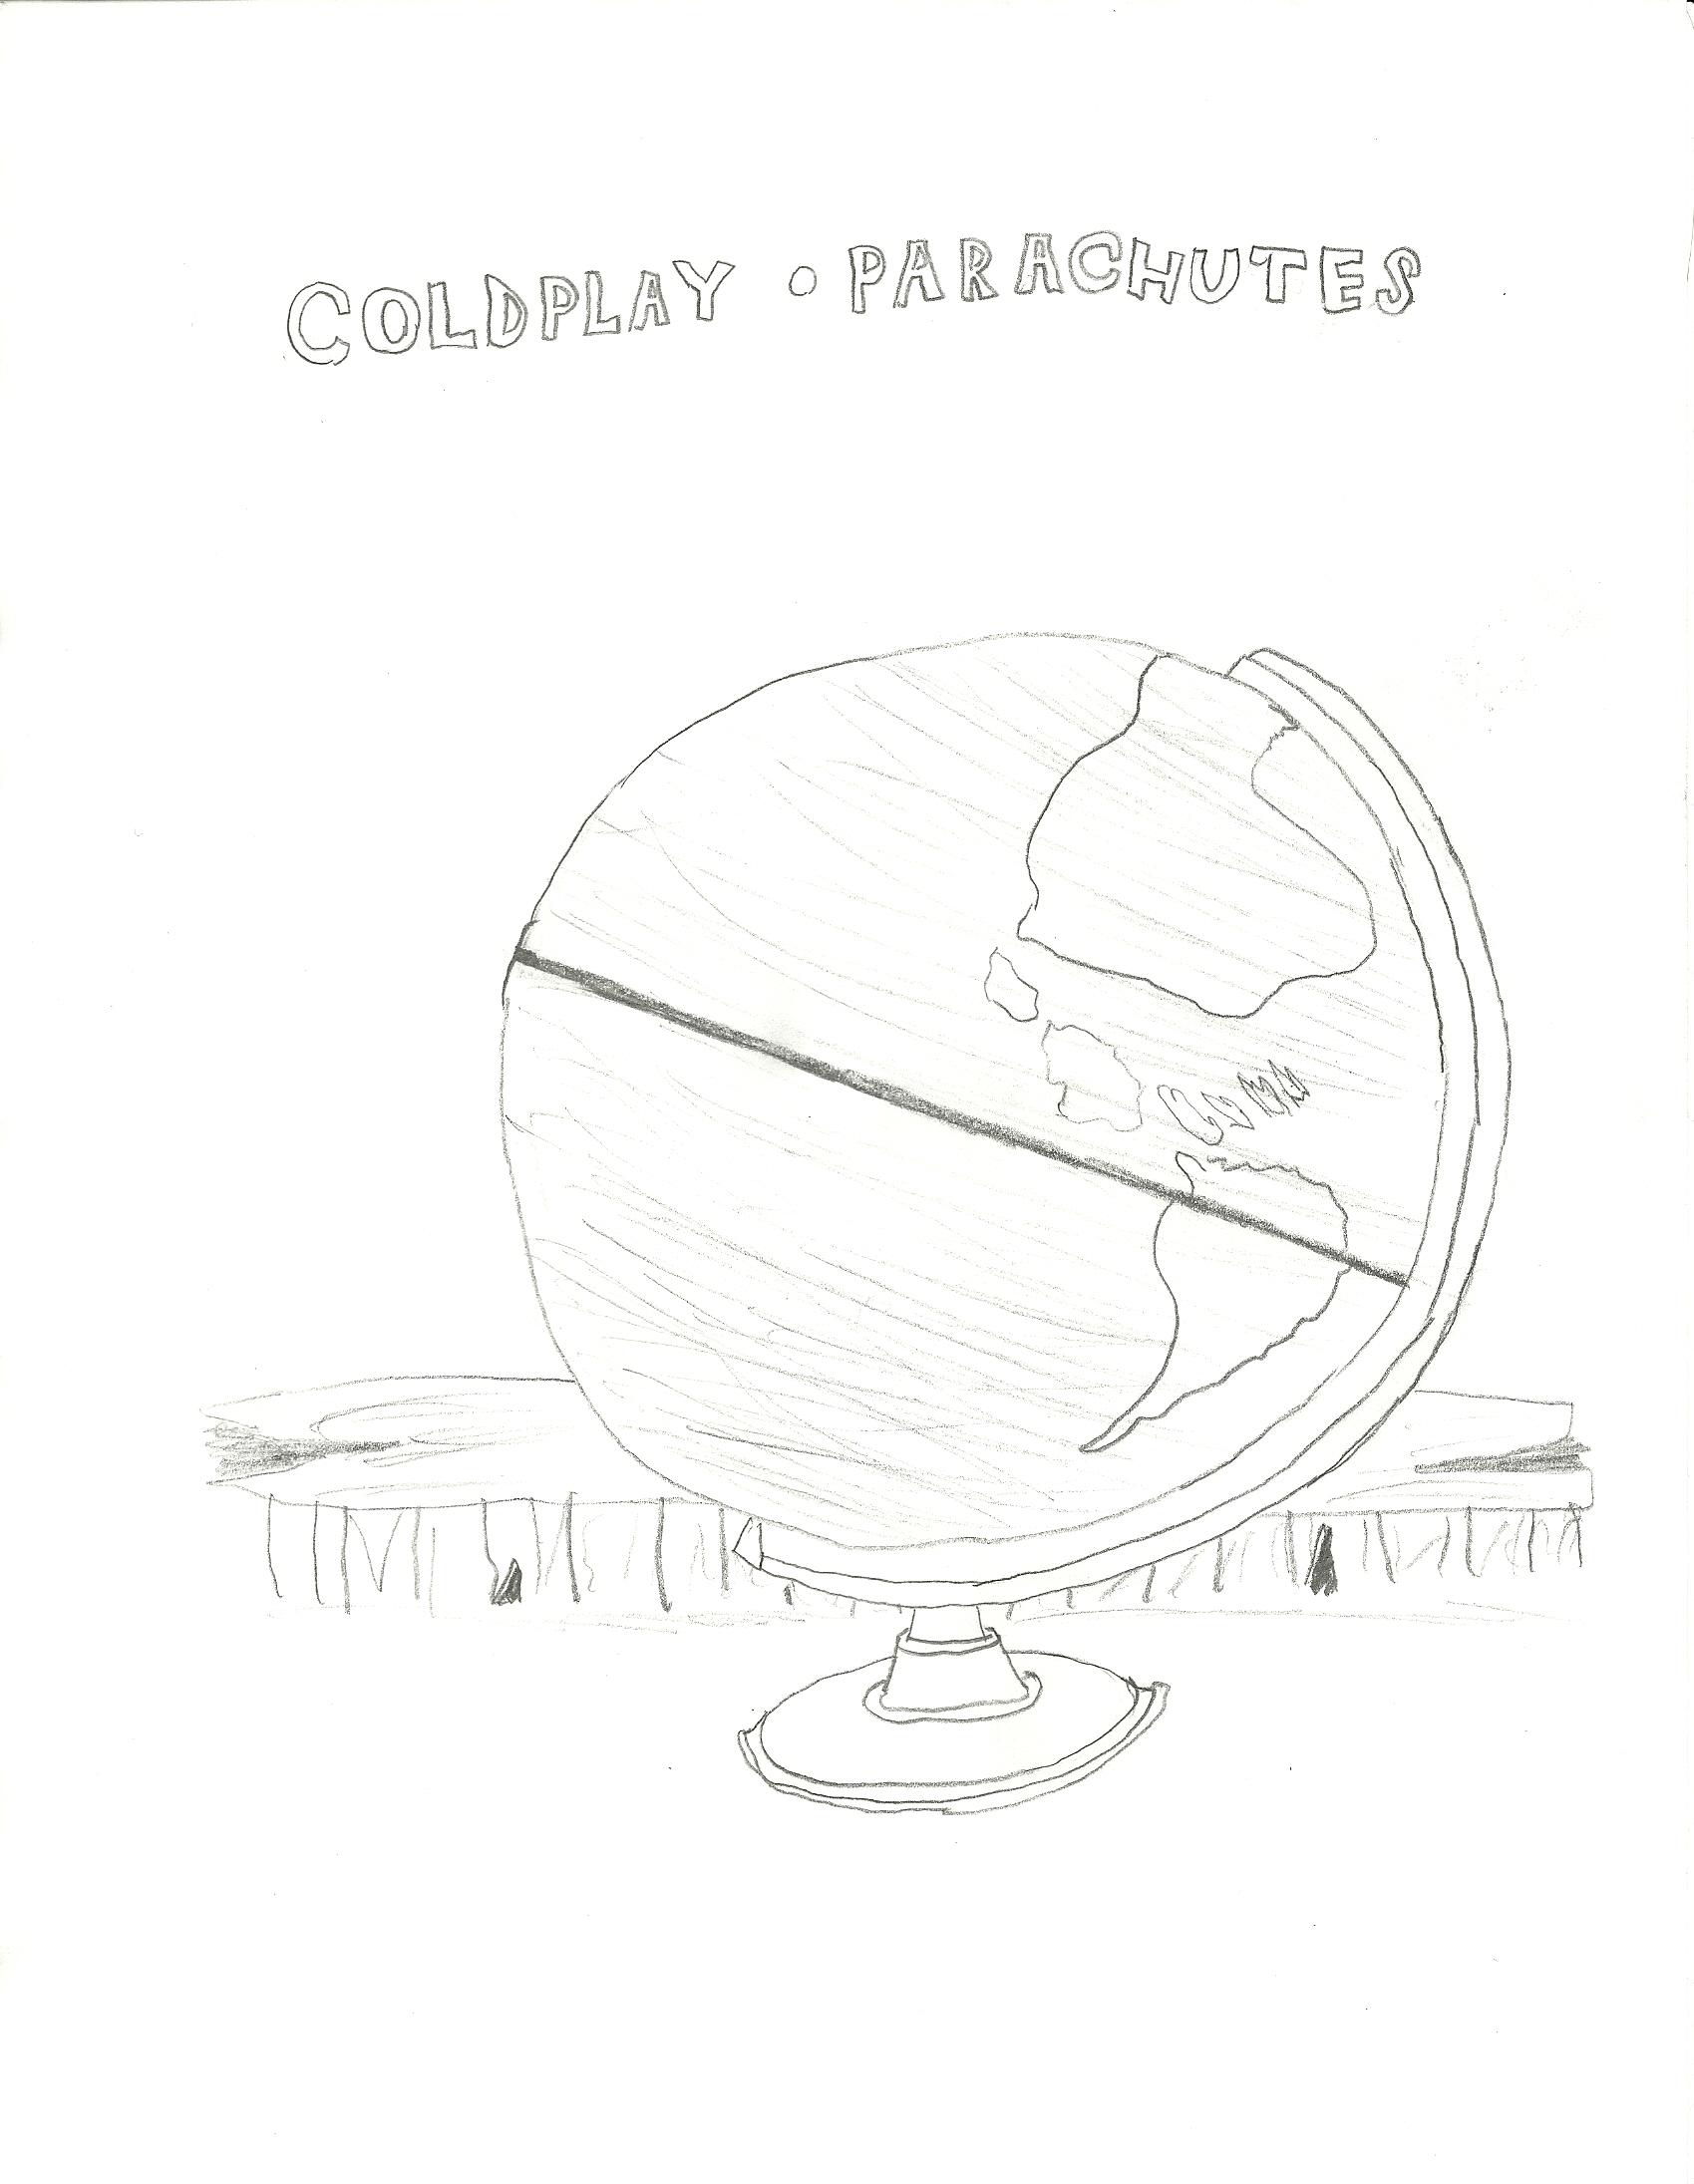 Coldplay Parachutes Album Cover